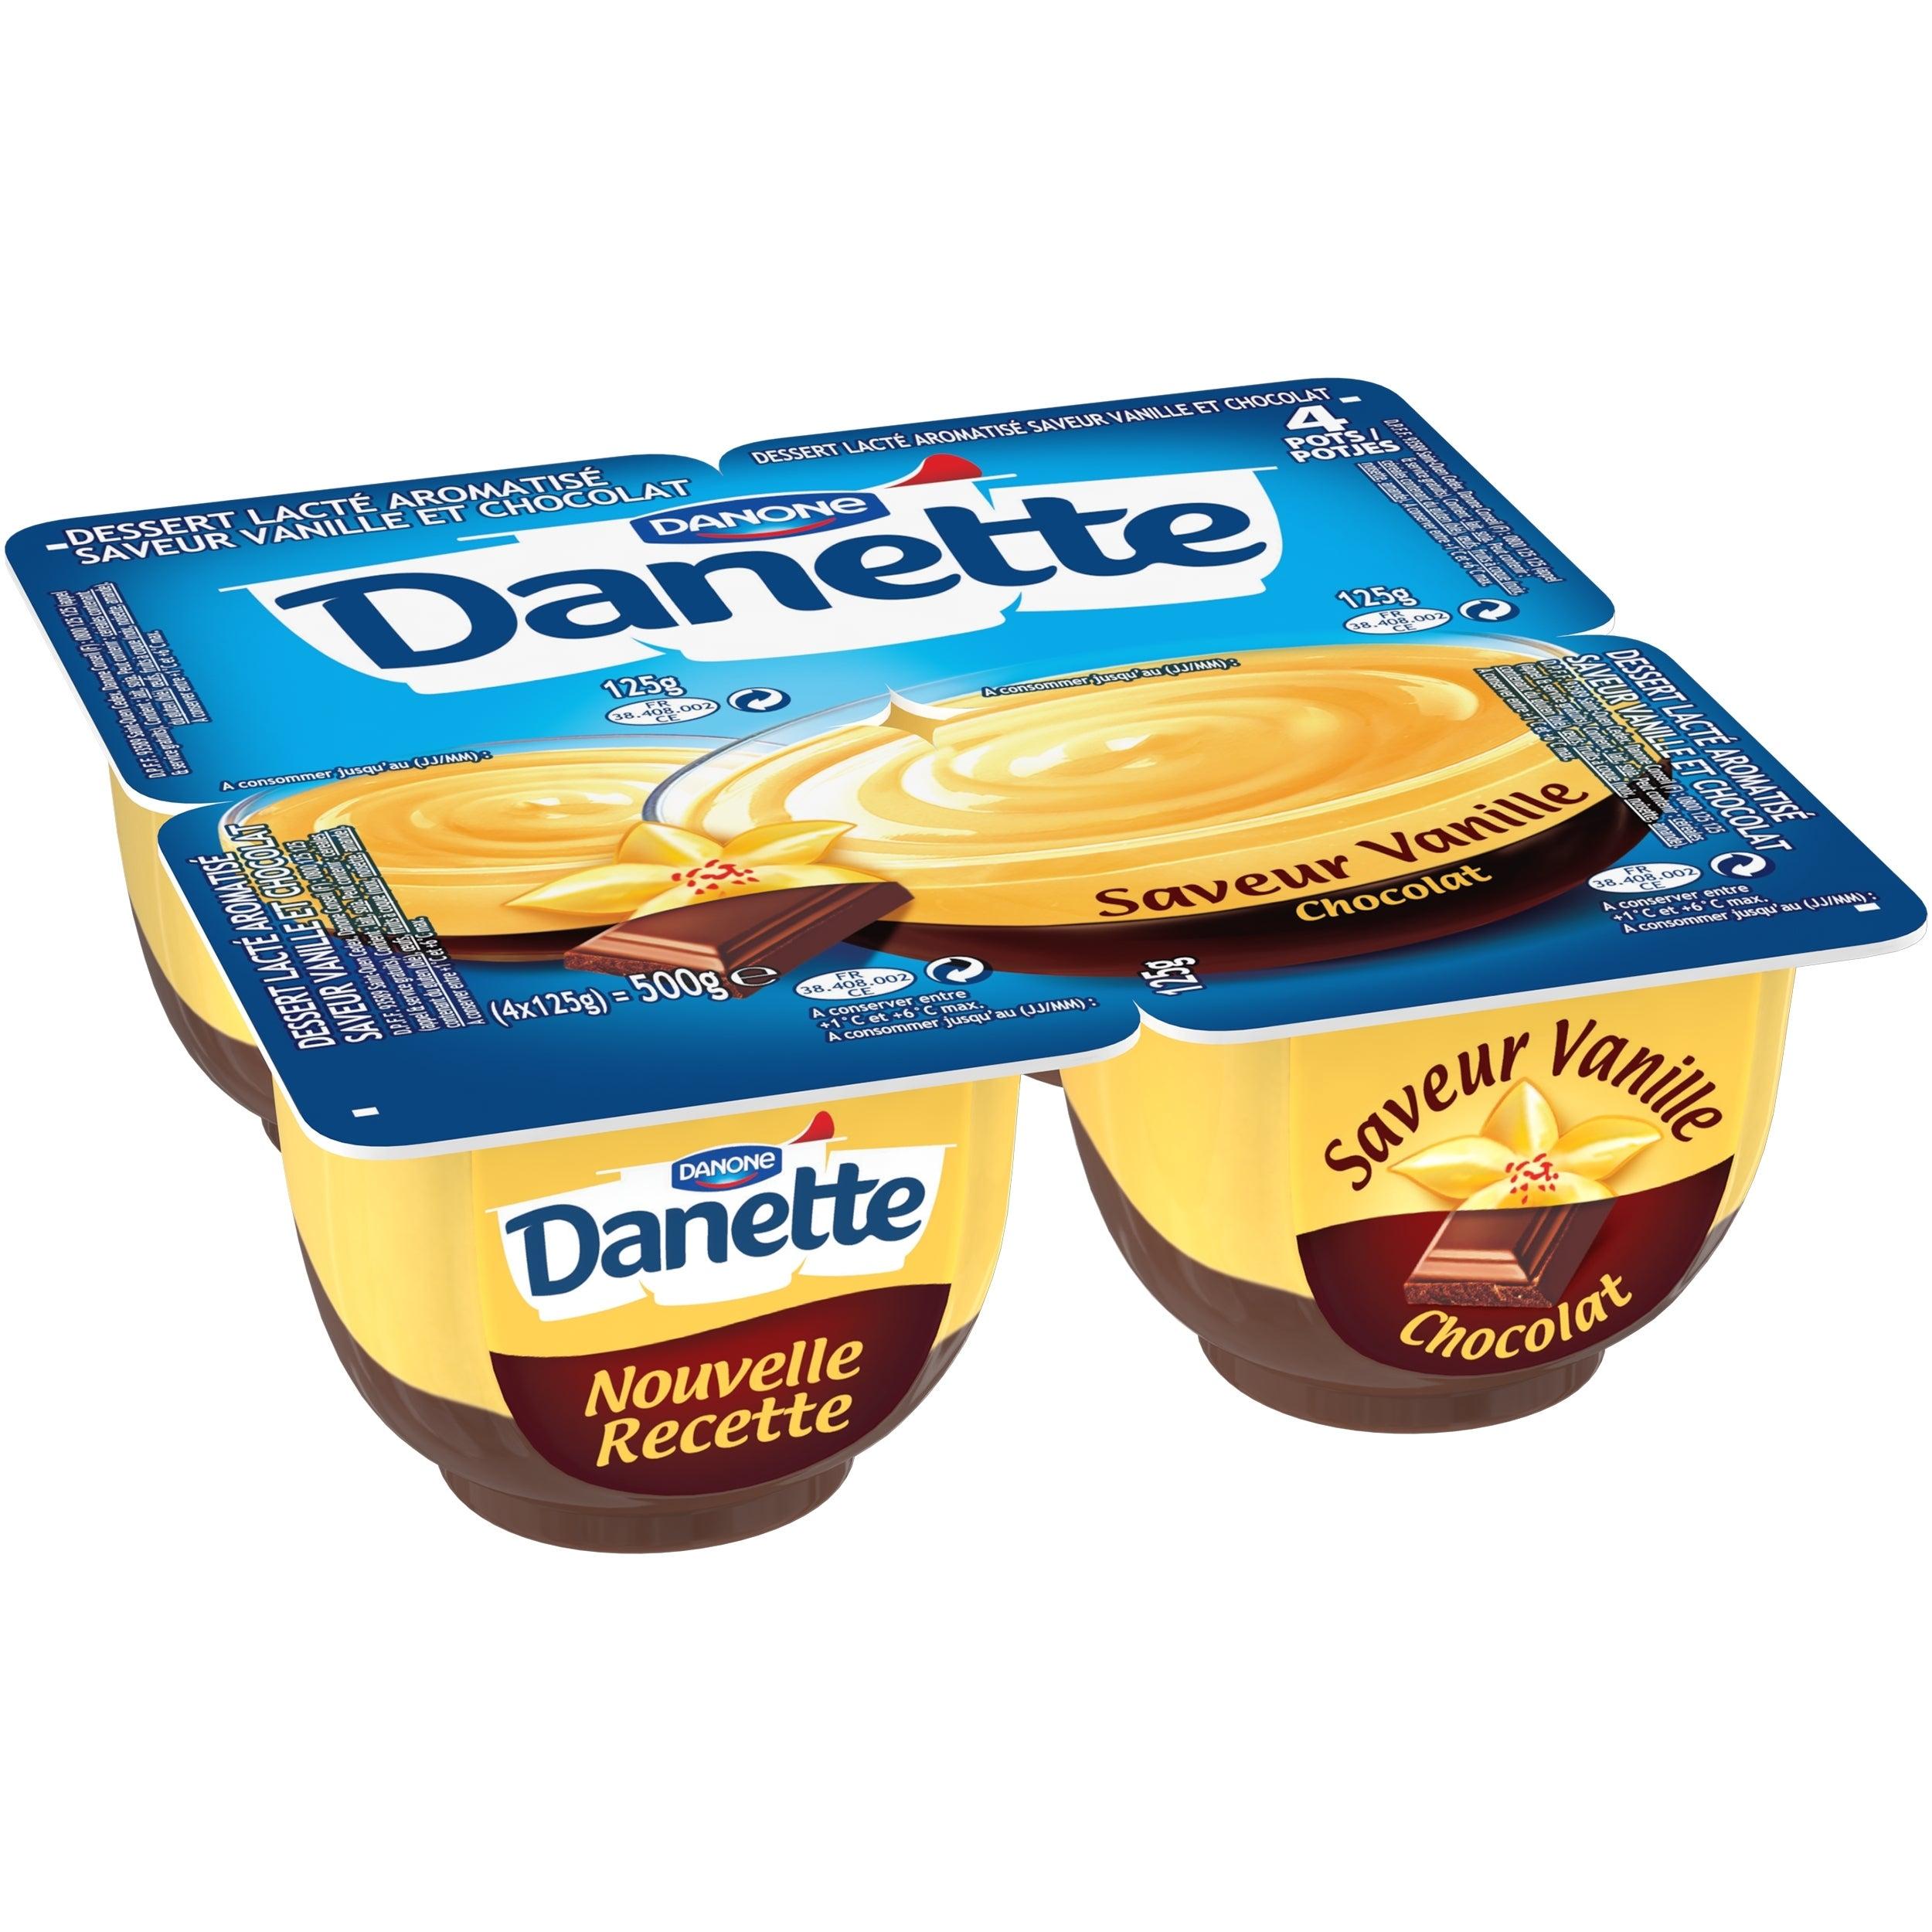 Danette creme dessert 4x125g vanille et chocolat